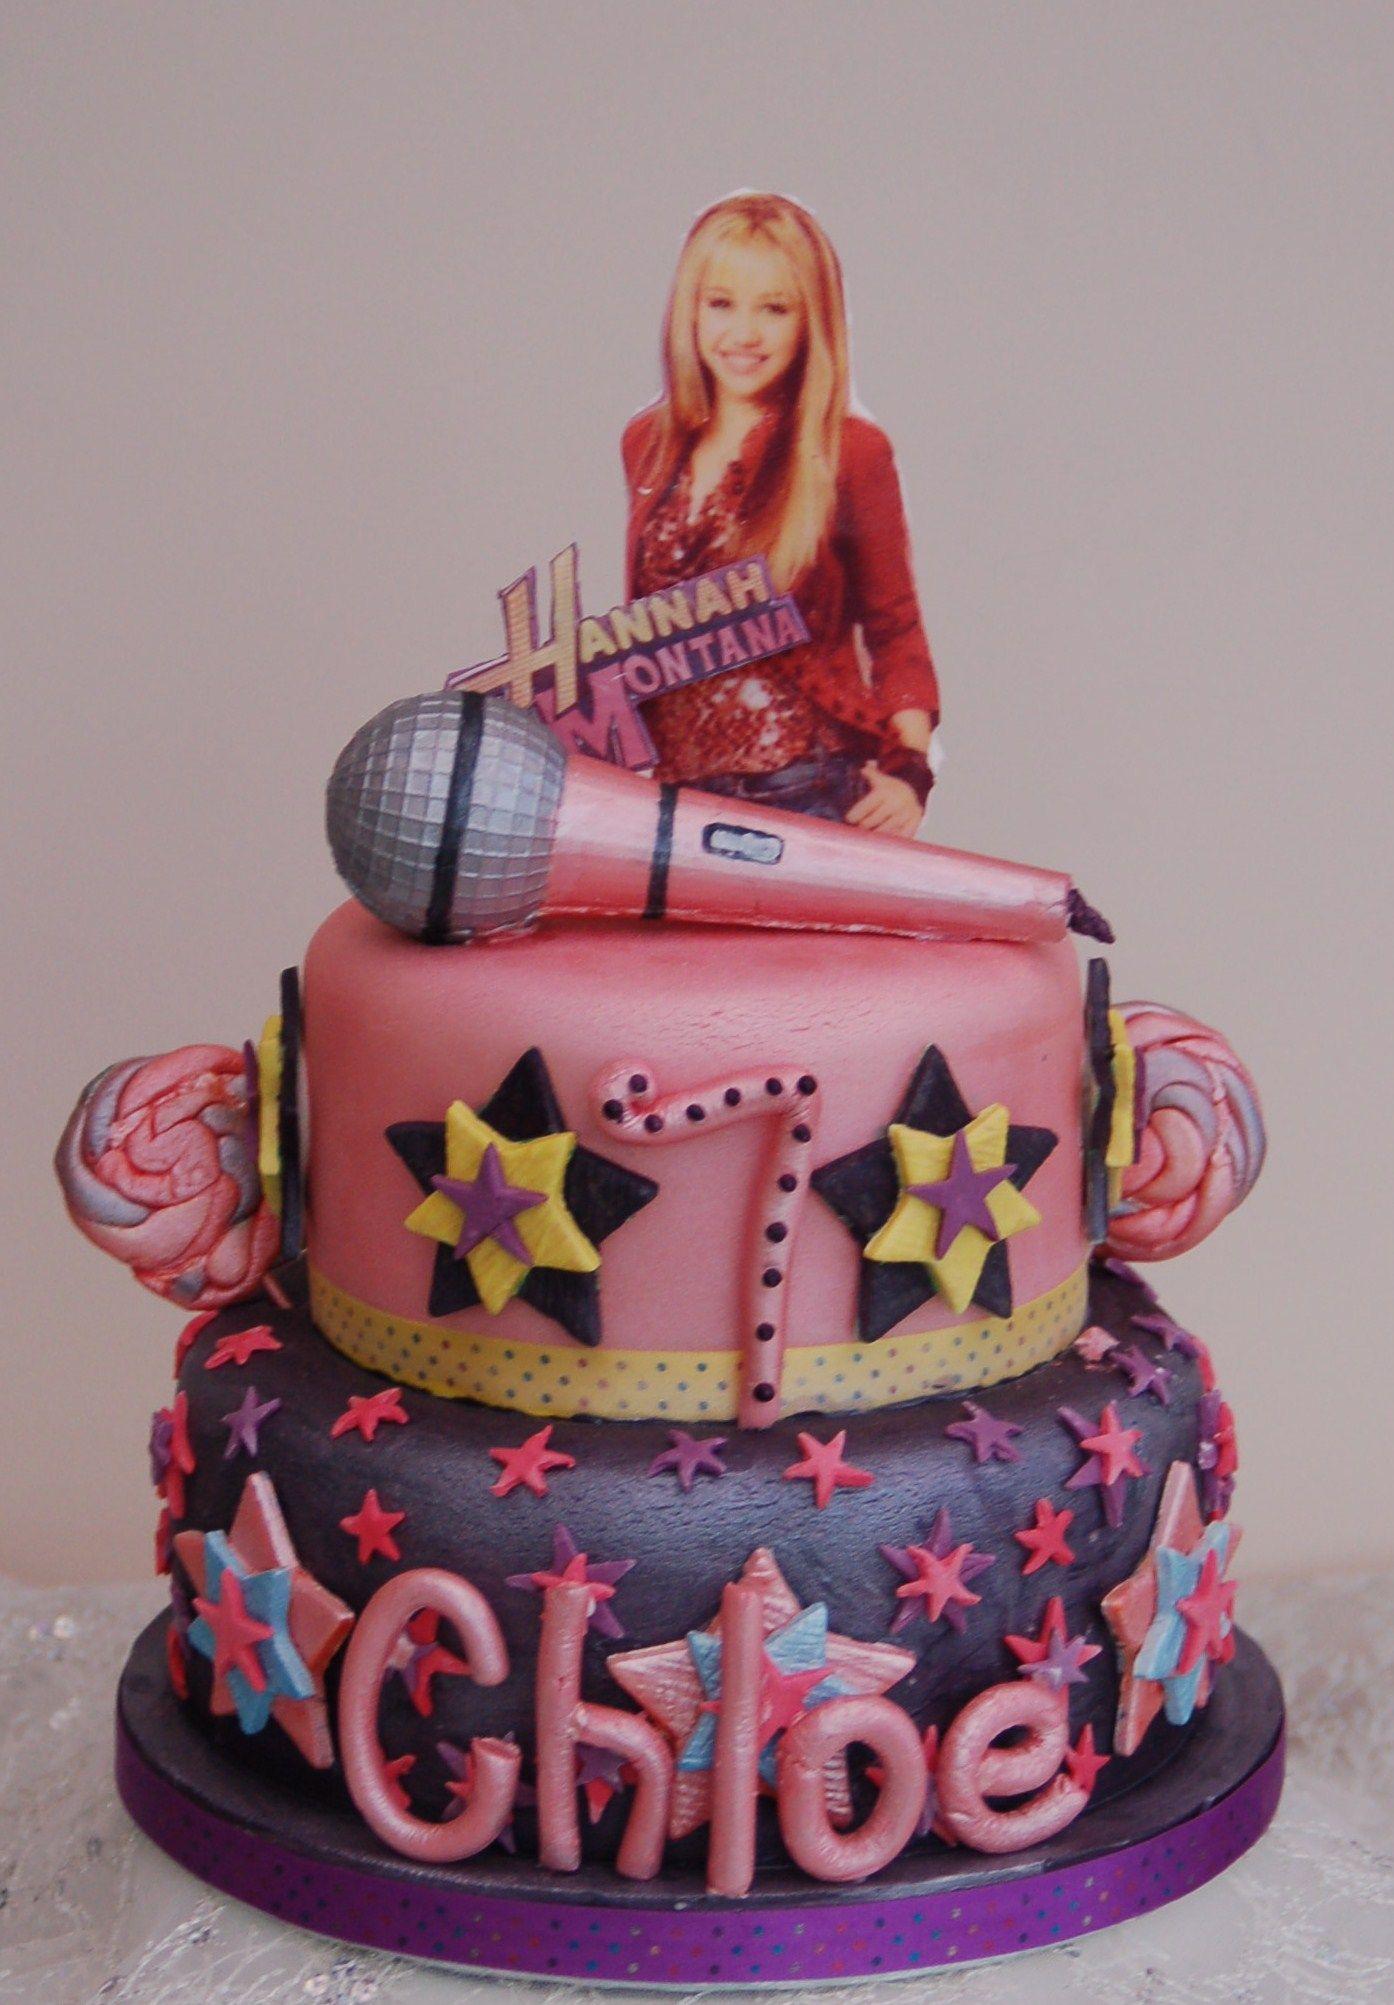 Enjoyable Hannah Montana Birthday Cake Cool Birthday Cakes Birthday Party Birthday Cards Printable Inklcafe Filternl